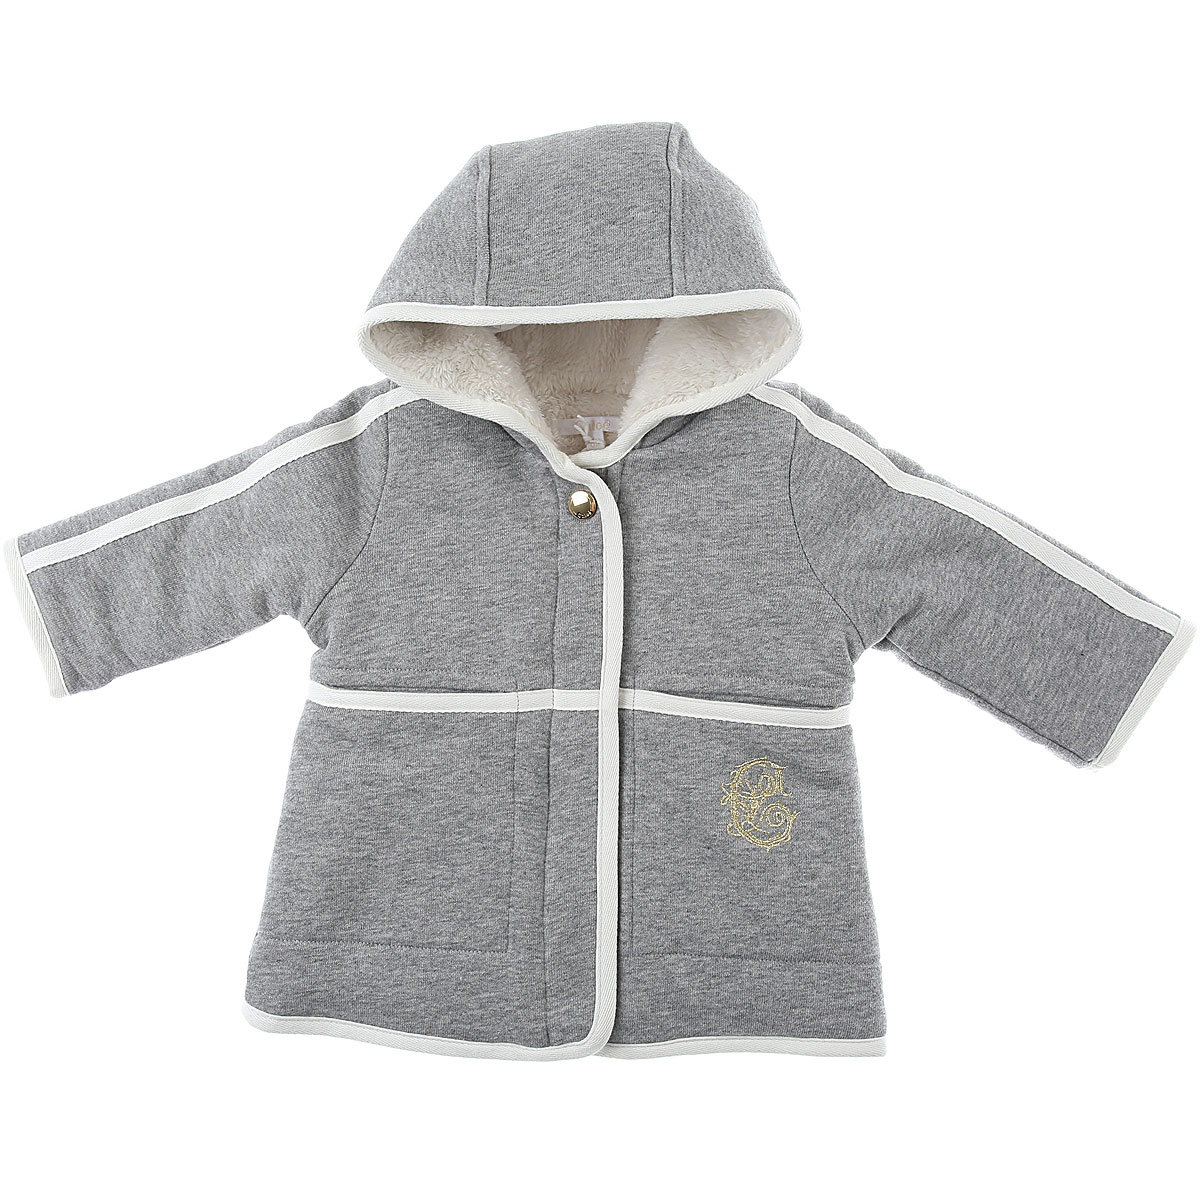 Chloe Baby Coats for Girls On Sale, Grey, Cotton, 2019, 12M 18M 2Y 3Y 6M 9M